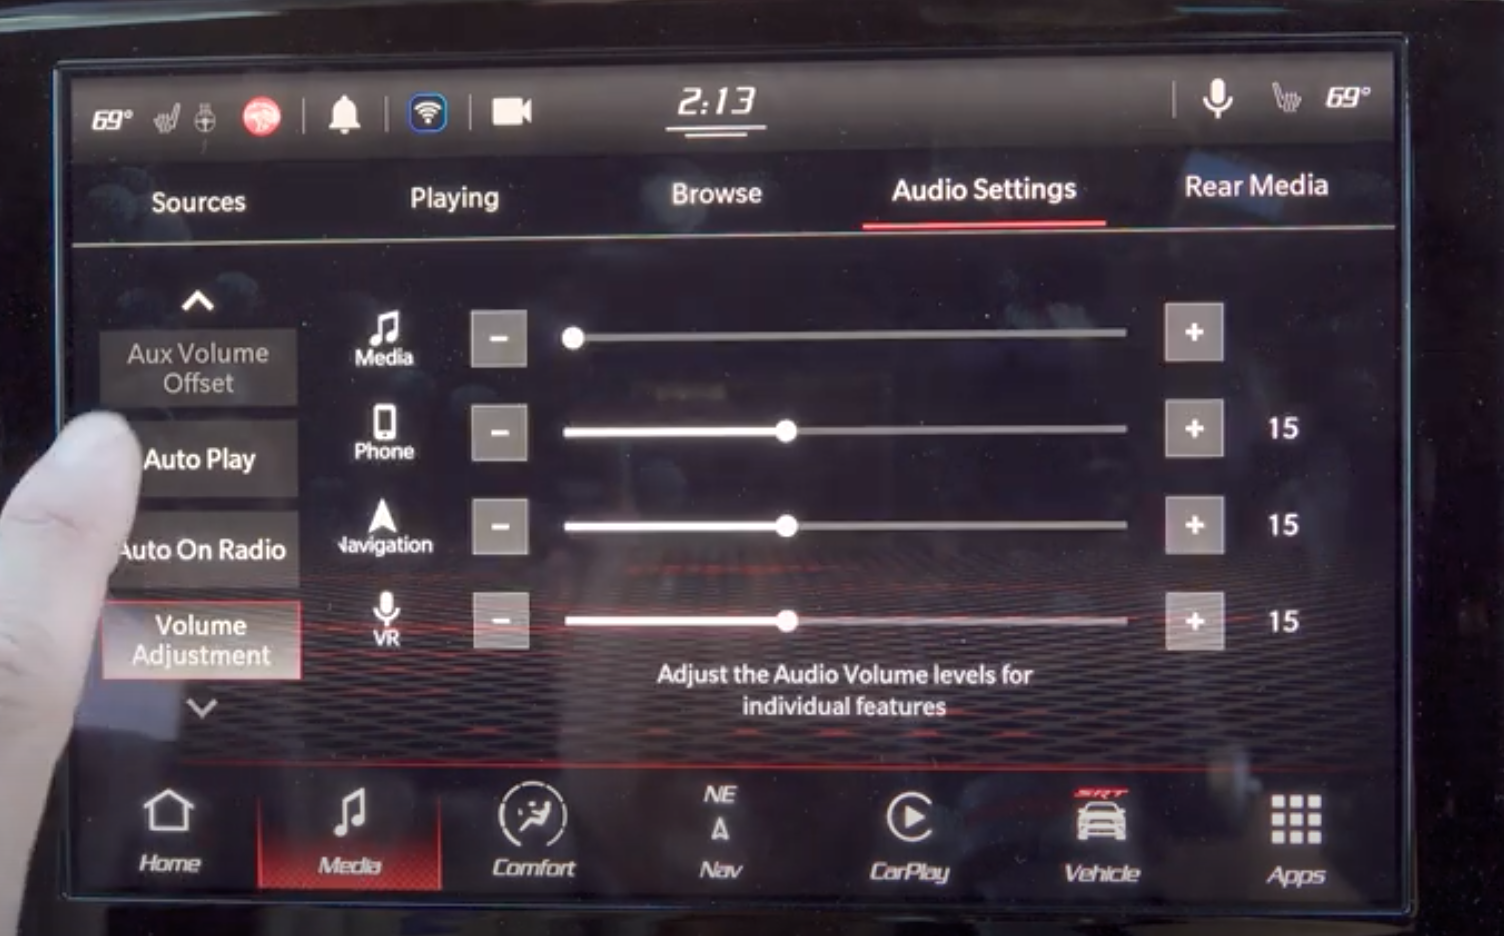 Adjusting the volume levels for the media sounds